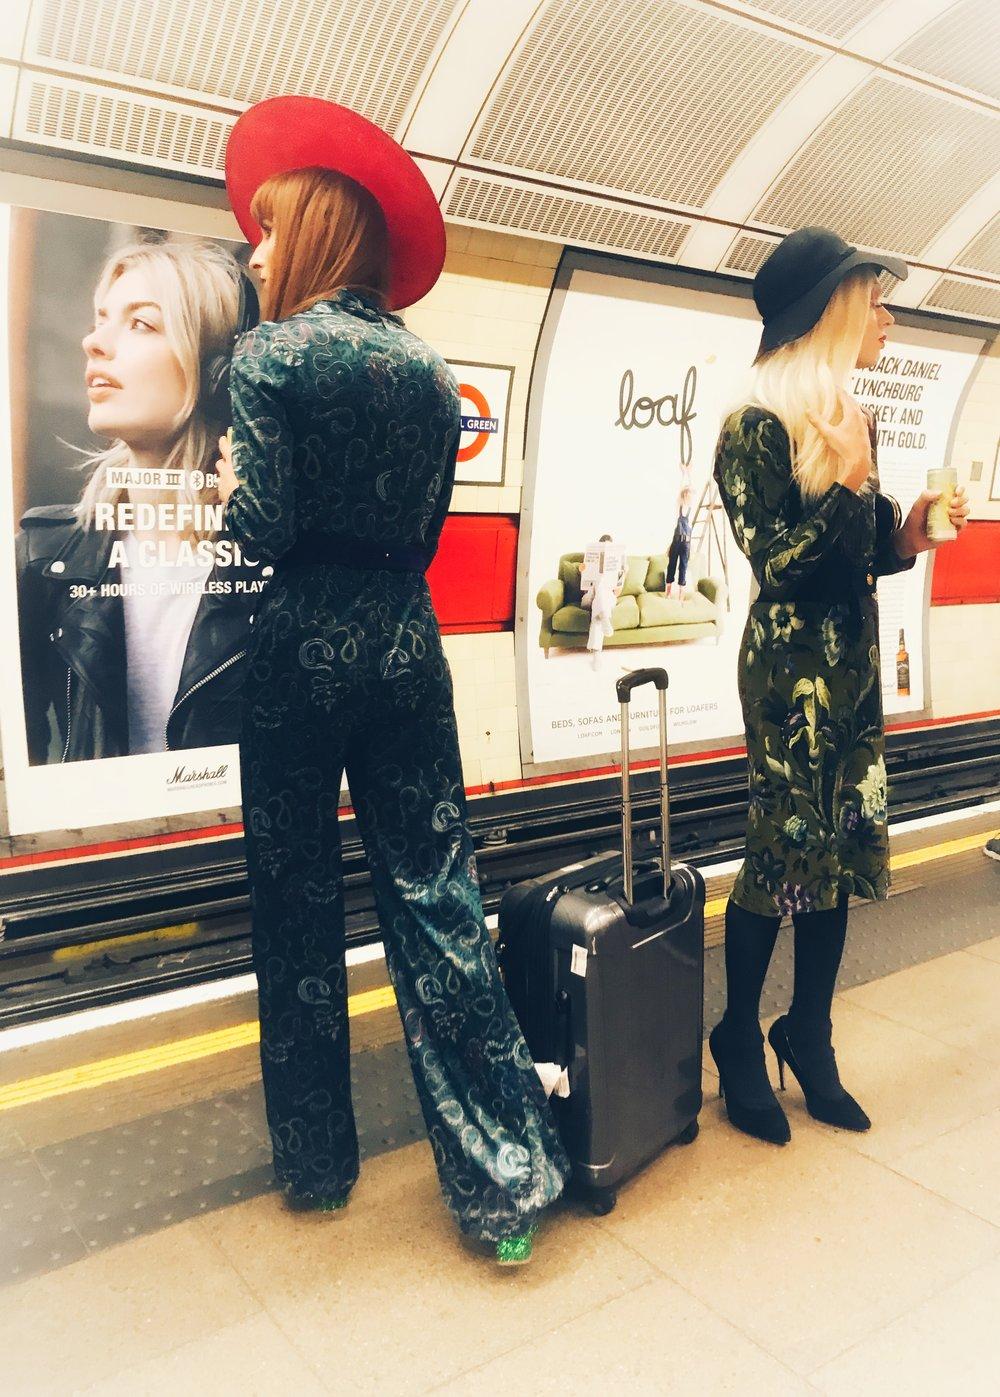 What a Drag! London Underground. Photo:  Joshua Williams